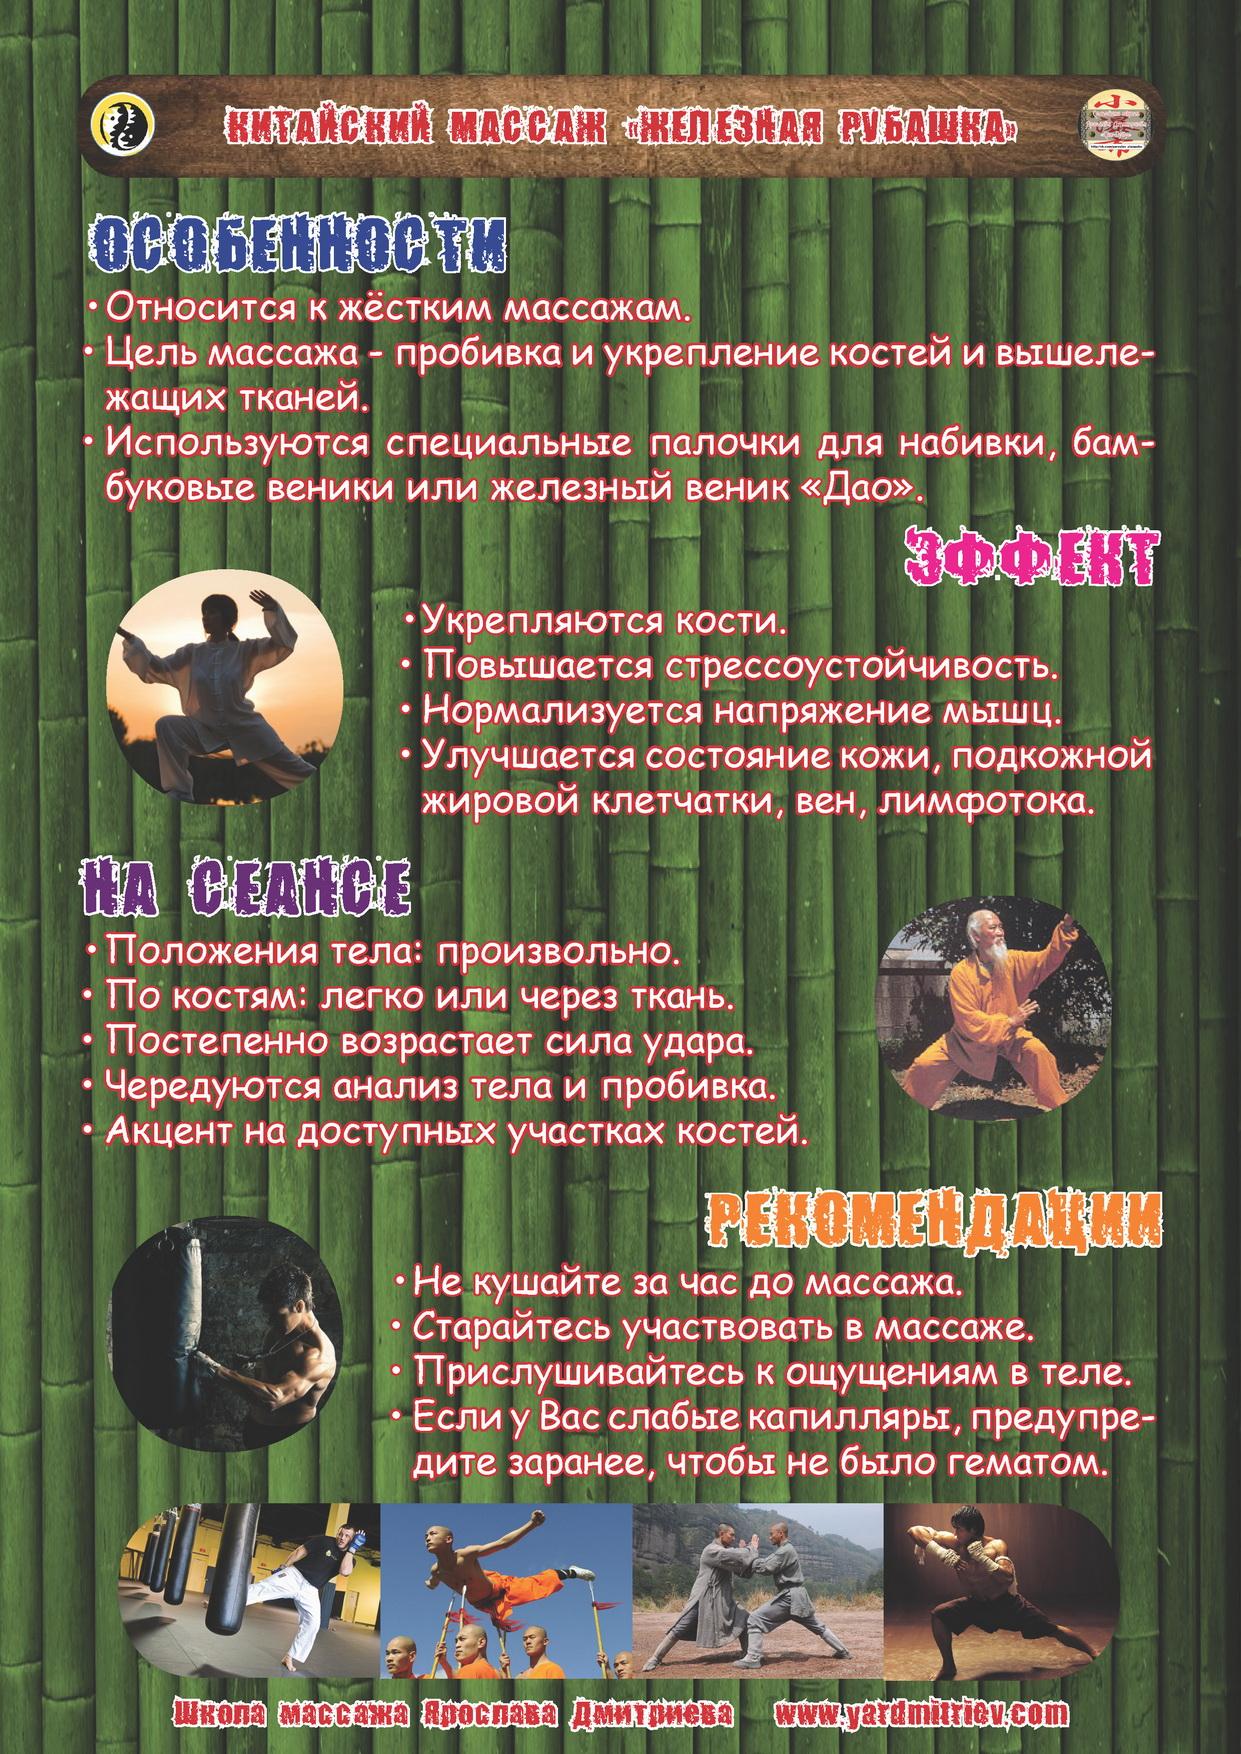 Китайский массаж железная рубашка